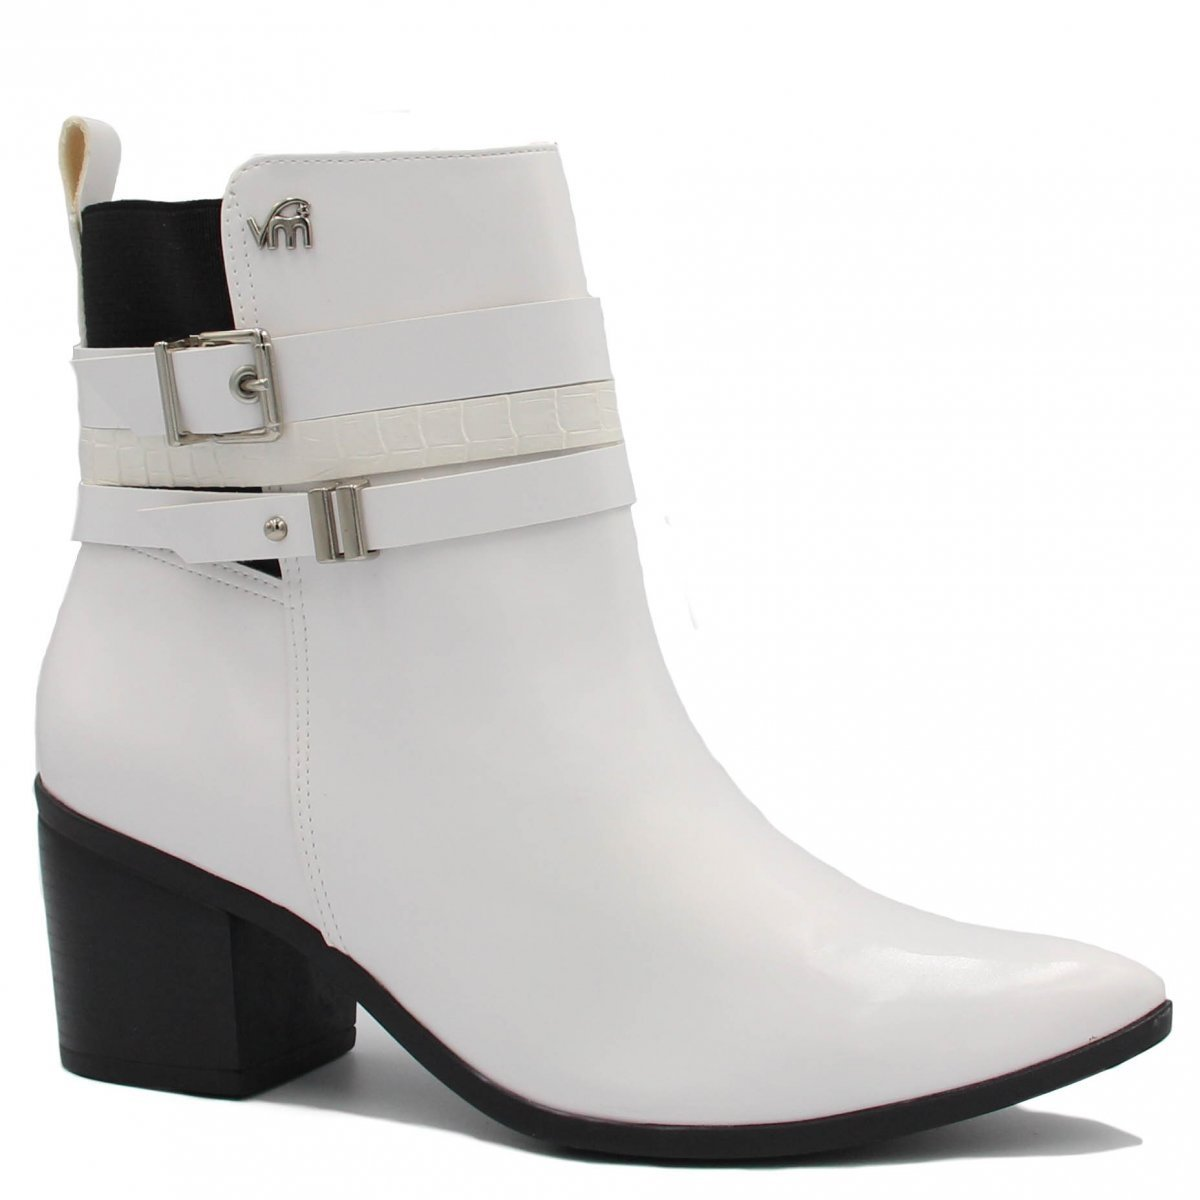 Feminino Ankle Branco Cano Boot Curto Fivela Via Marte Bota BA600w